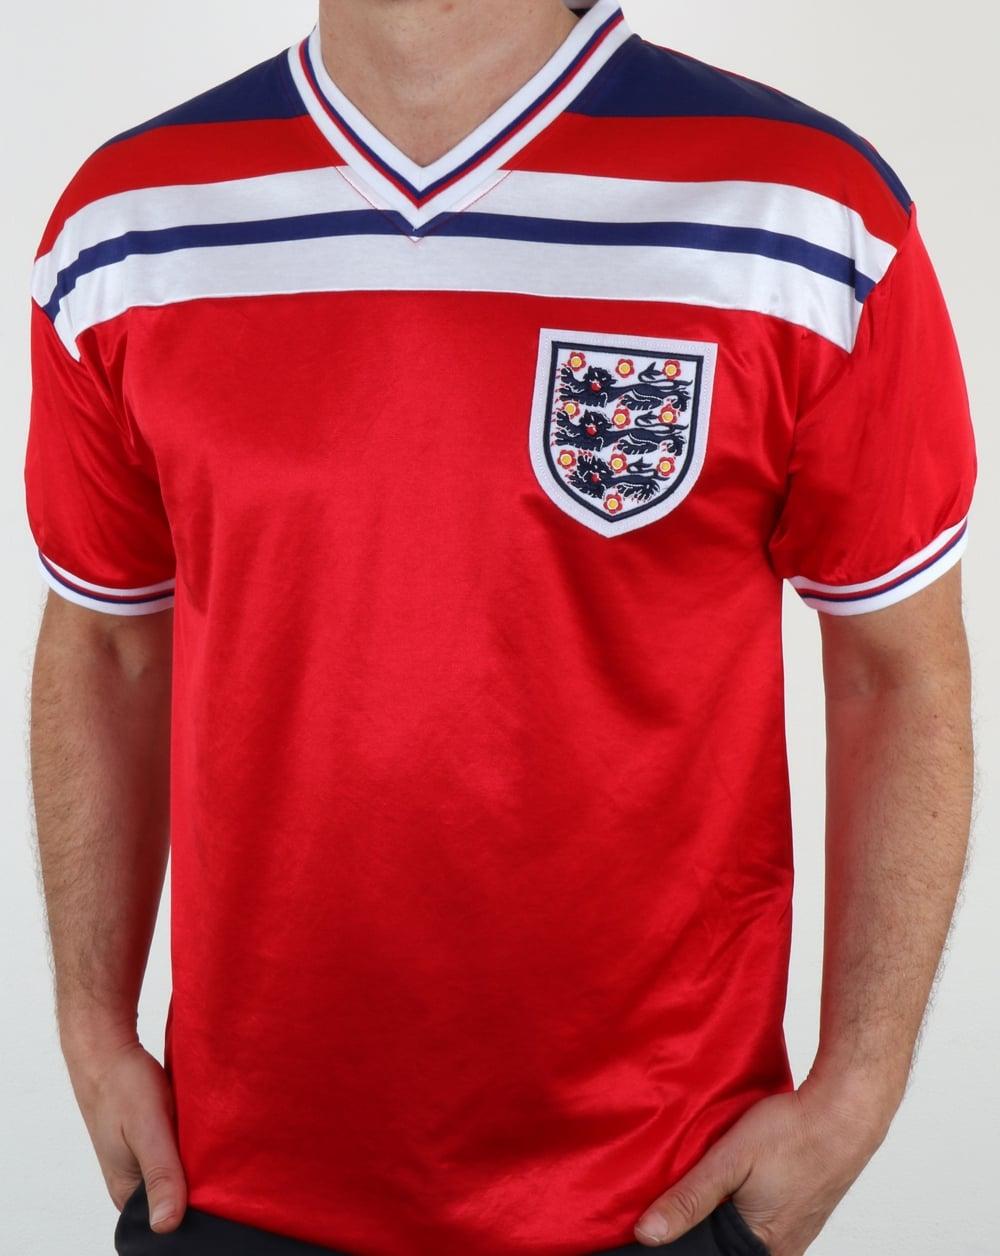 england retro football shirts 1982